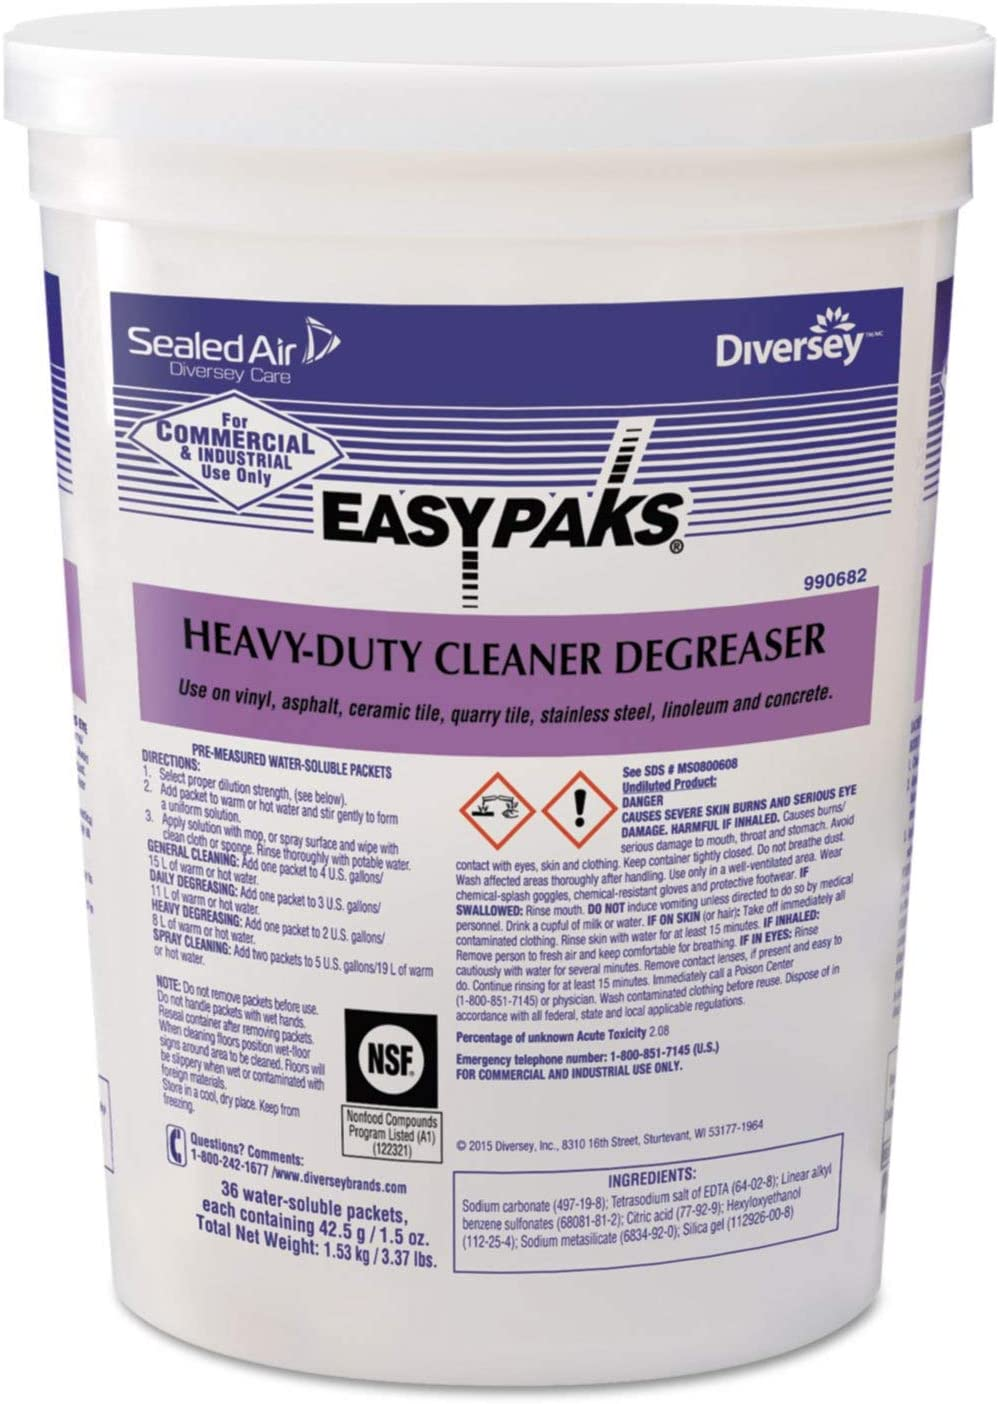 Cleaner Degreaser, Size 1.5 oz, PK2